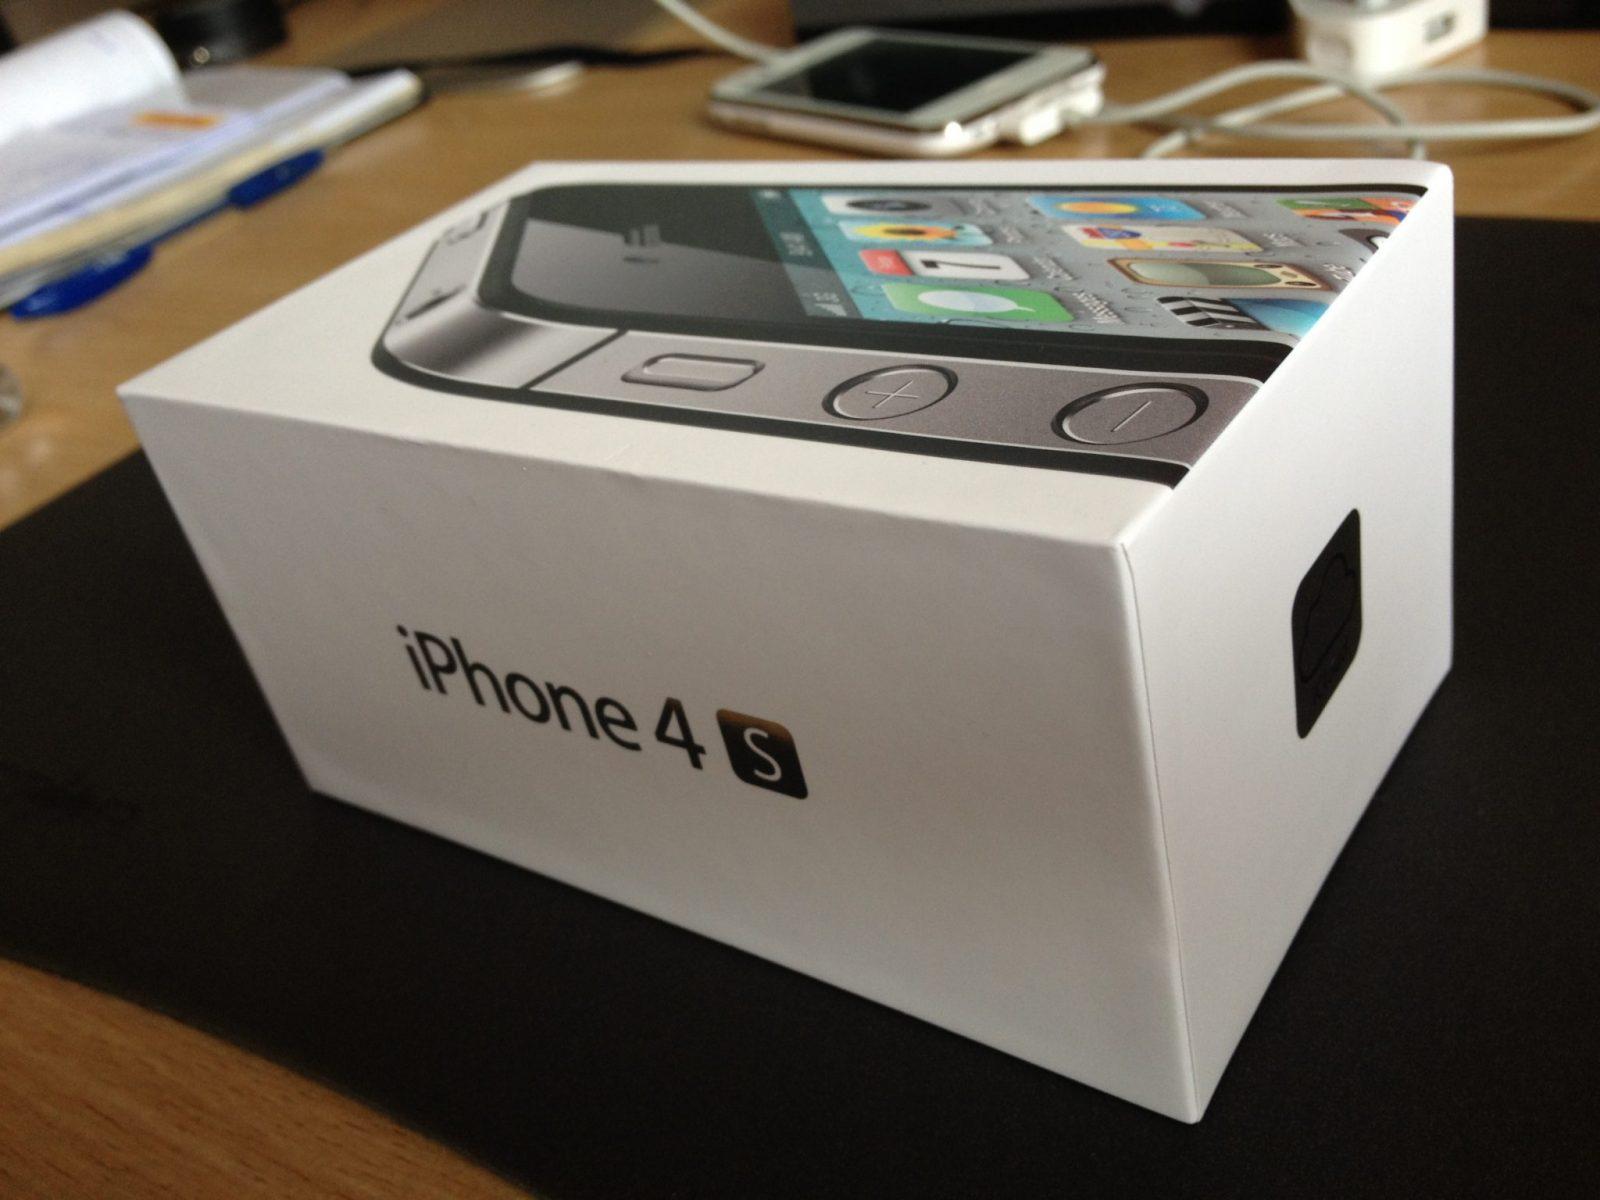 Recenzja: iPhone 4S w AppleMobile.pl